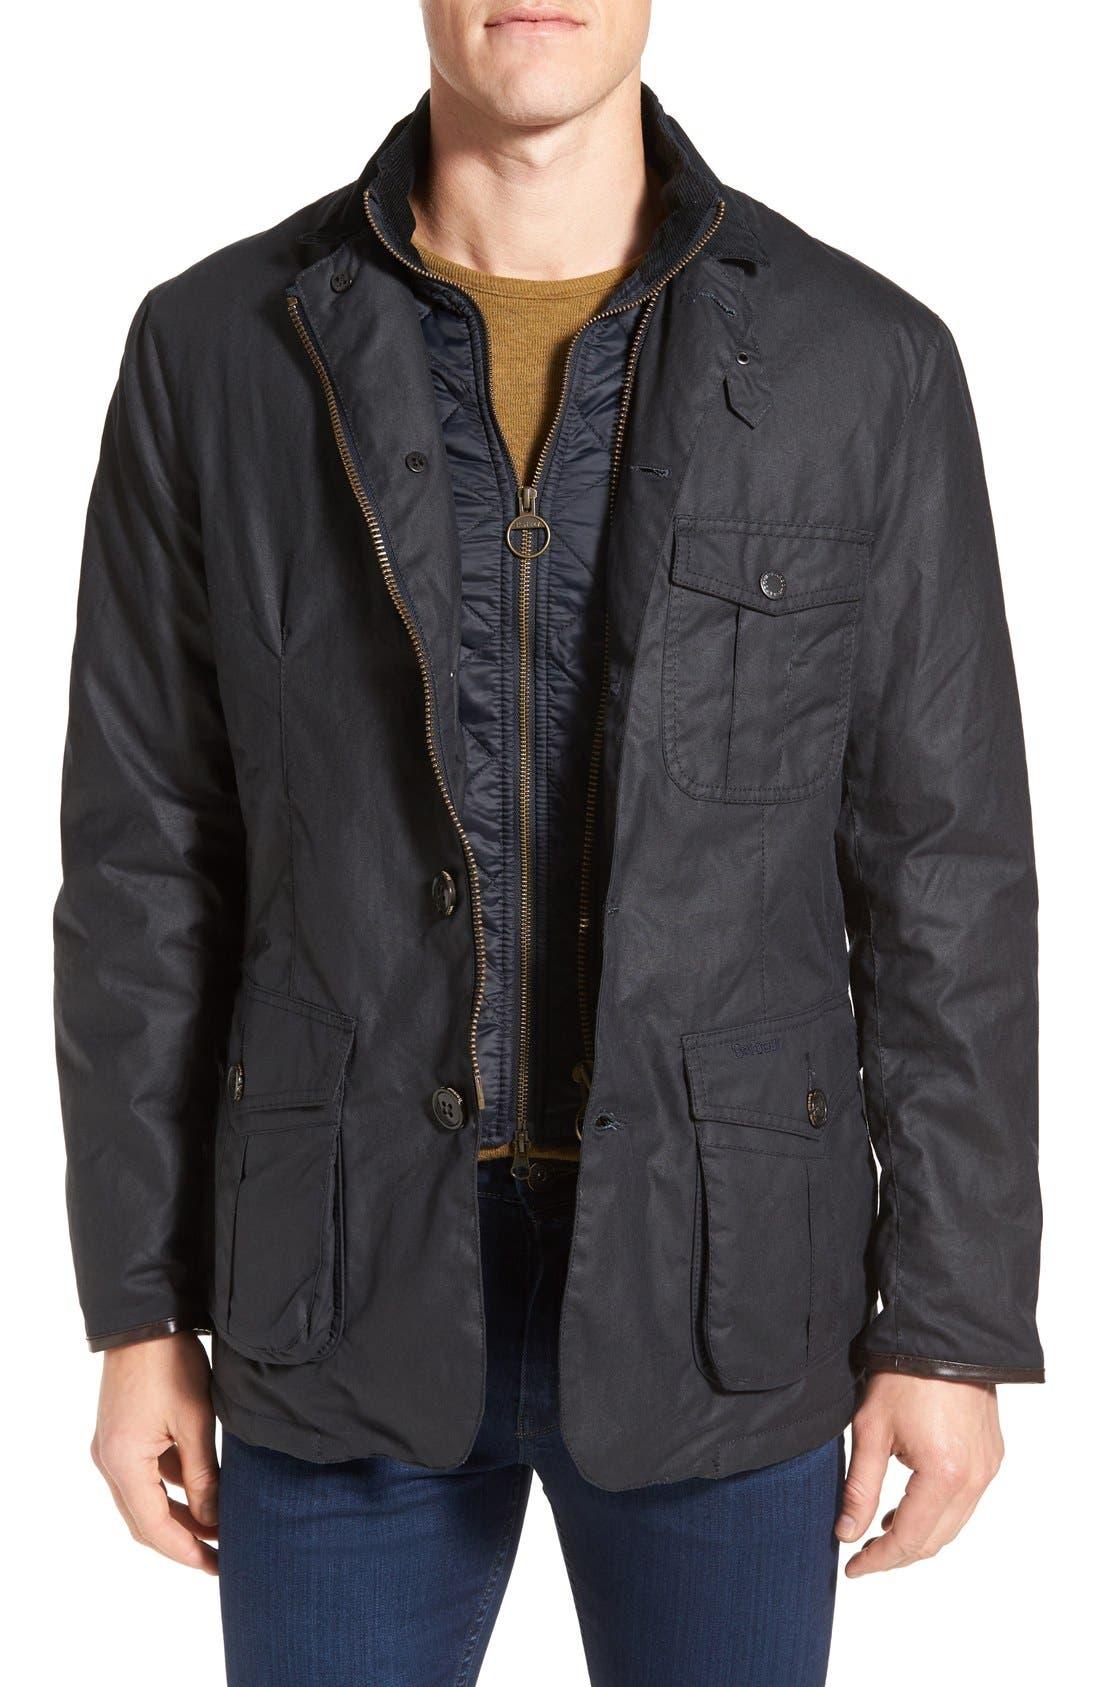 Torridon Wax Jacket with Bib,                             Main thumbnail 1, color,                             410